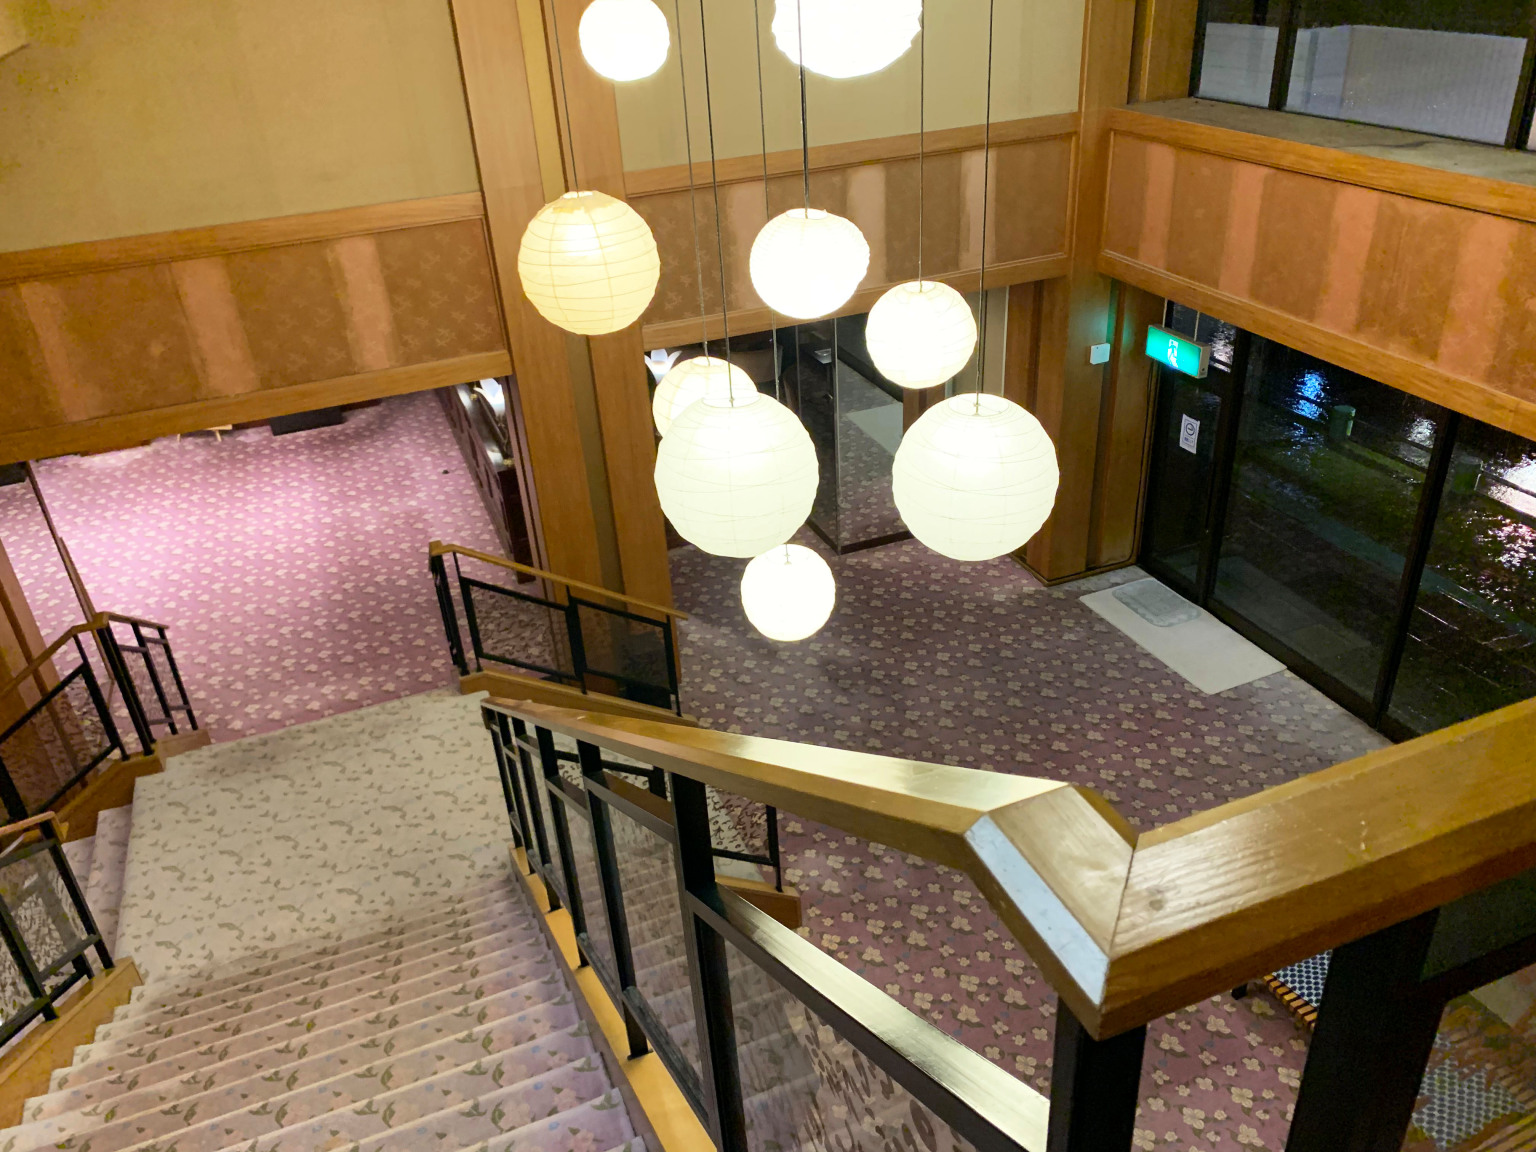 Houshi-Ryokan-onsen-hotel-oldest-in-world-Japan-business-travel-Hoshi-accommodation-stay-photos-reviews-Ishikawa-5.jpg